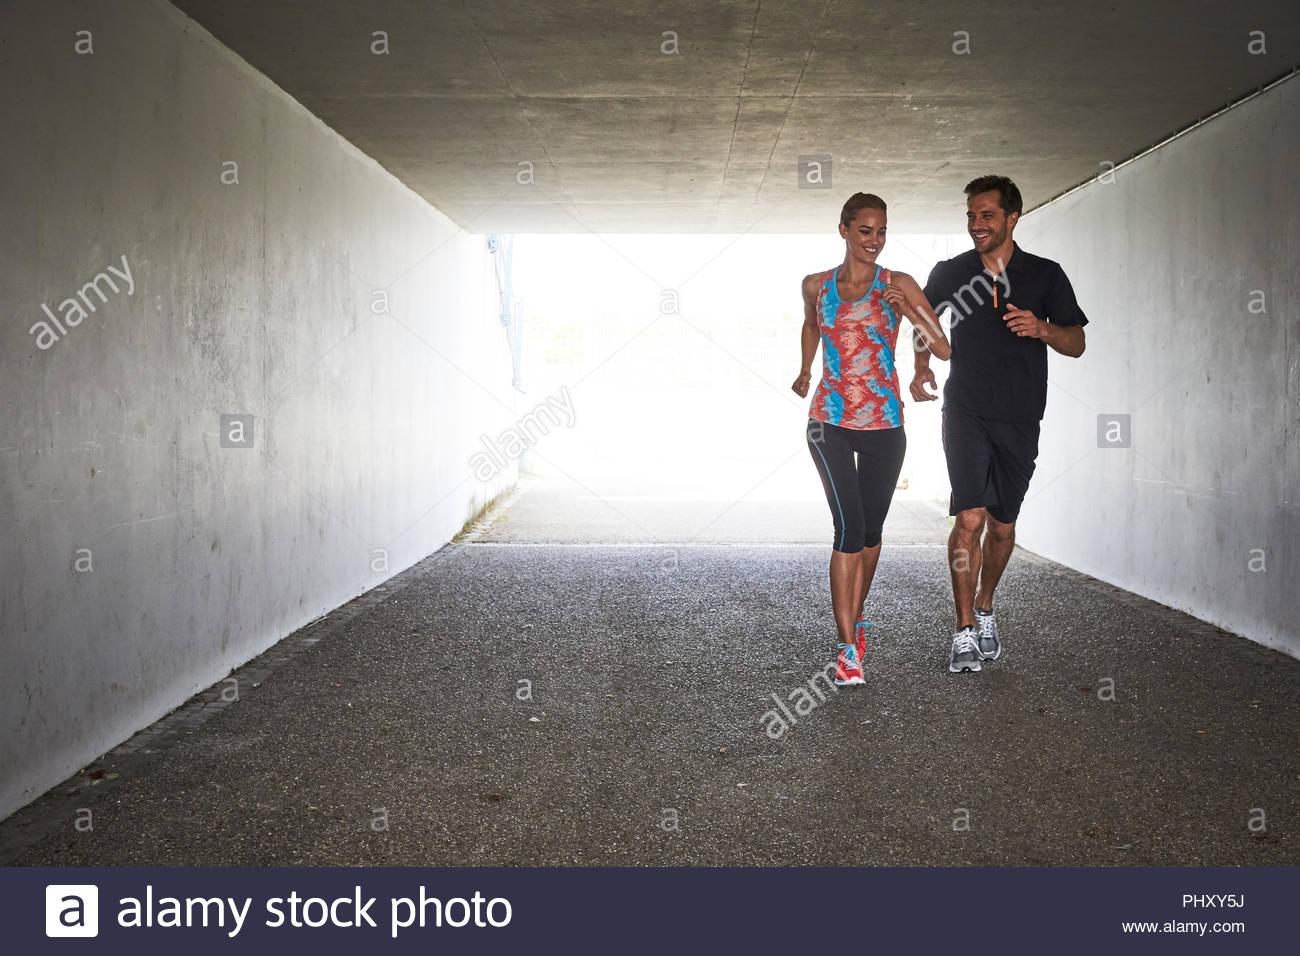 Pareja joven trotar en el túnel Imagen De Stock